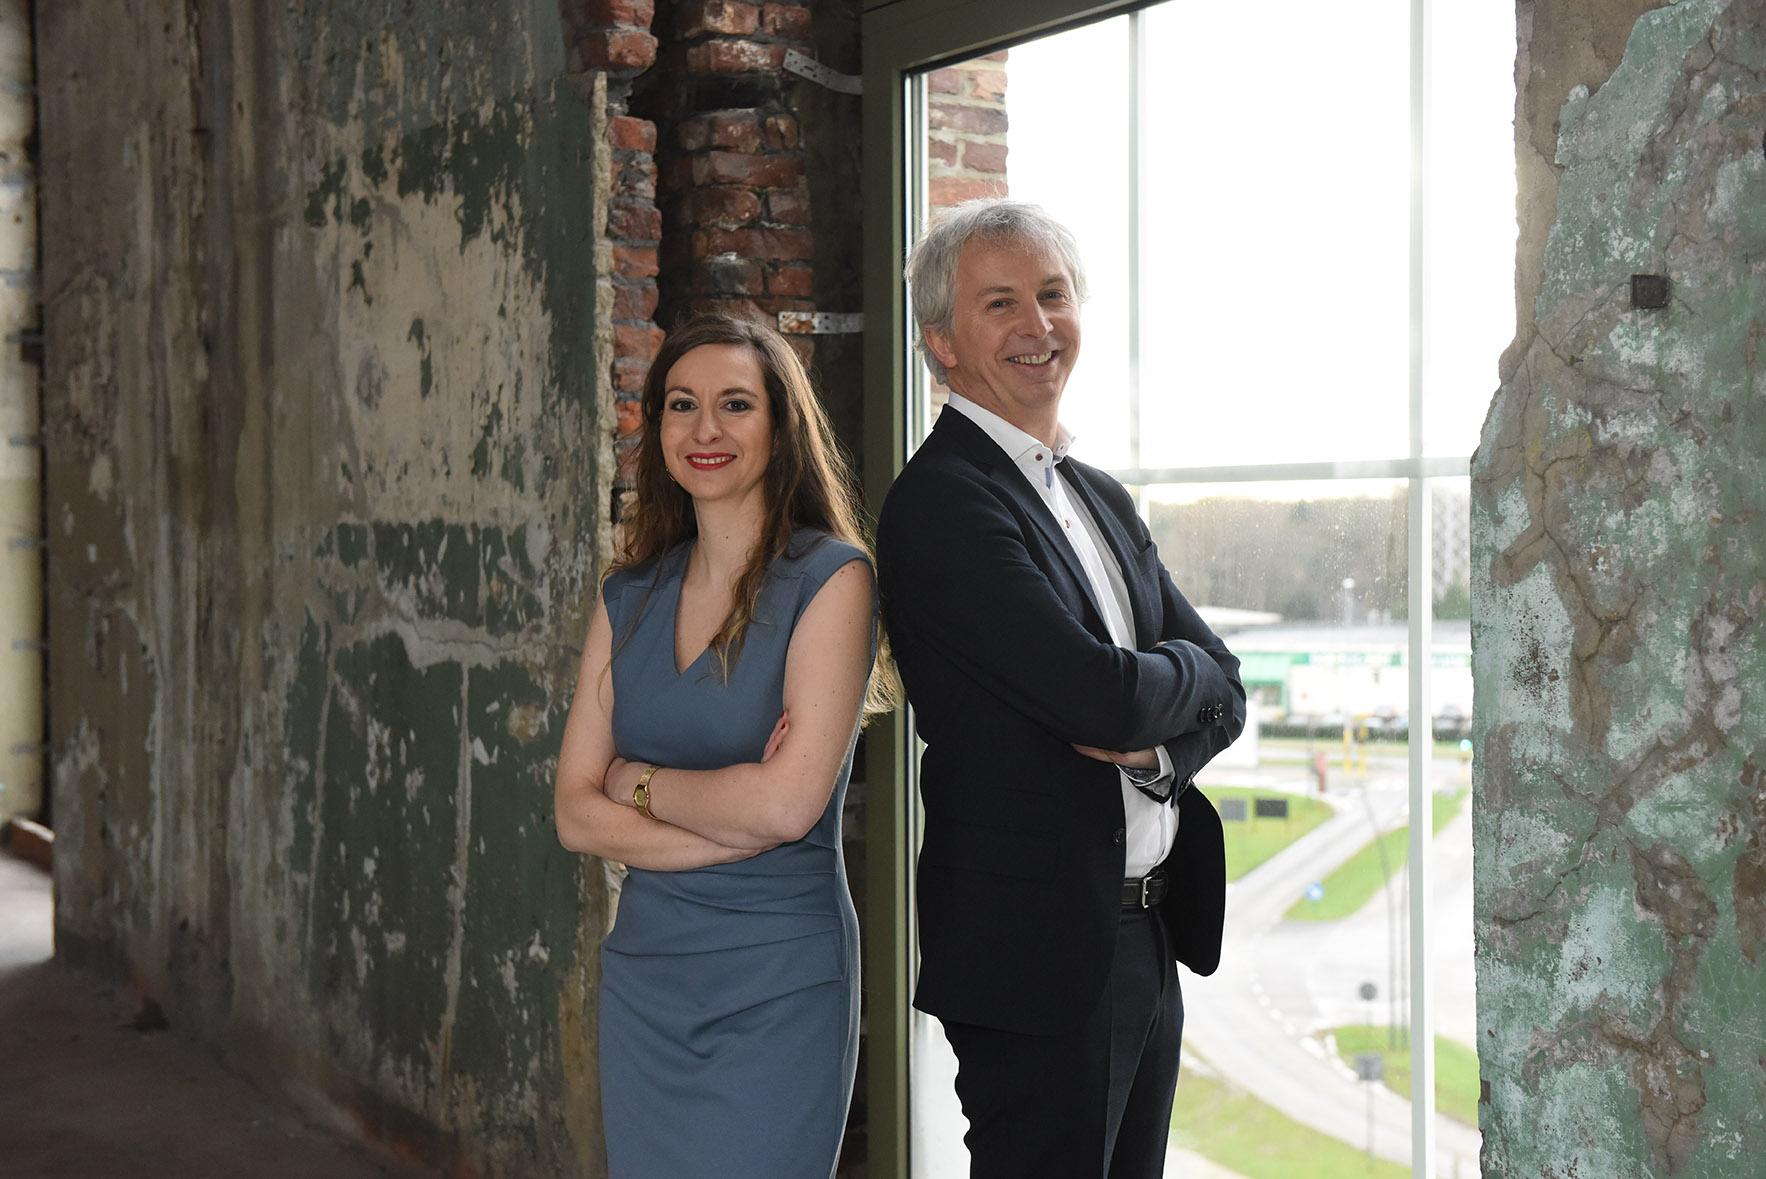 Sabrina Fiorelli en Tom Arts,experts in arbeidsrecht.